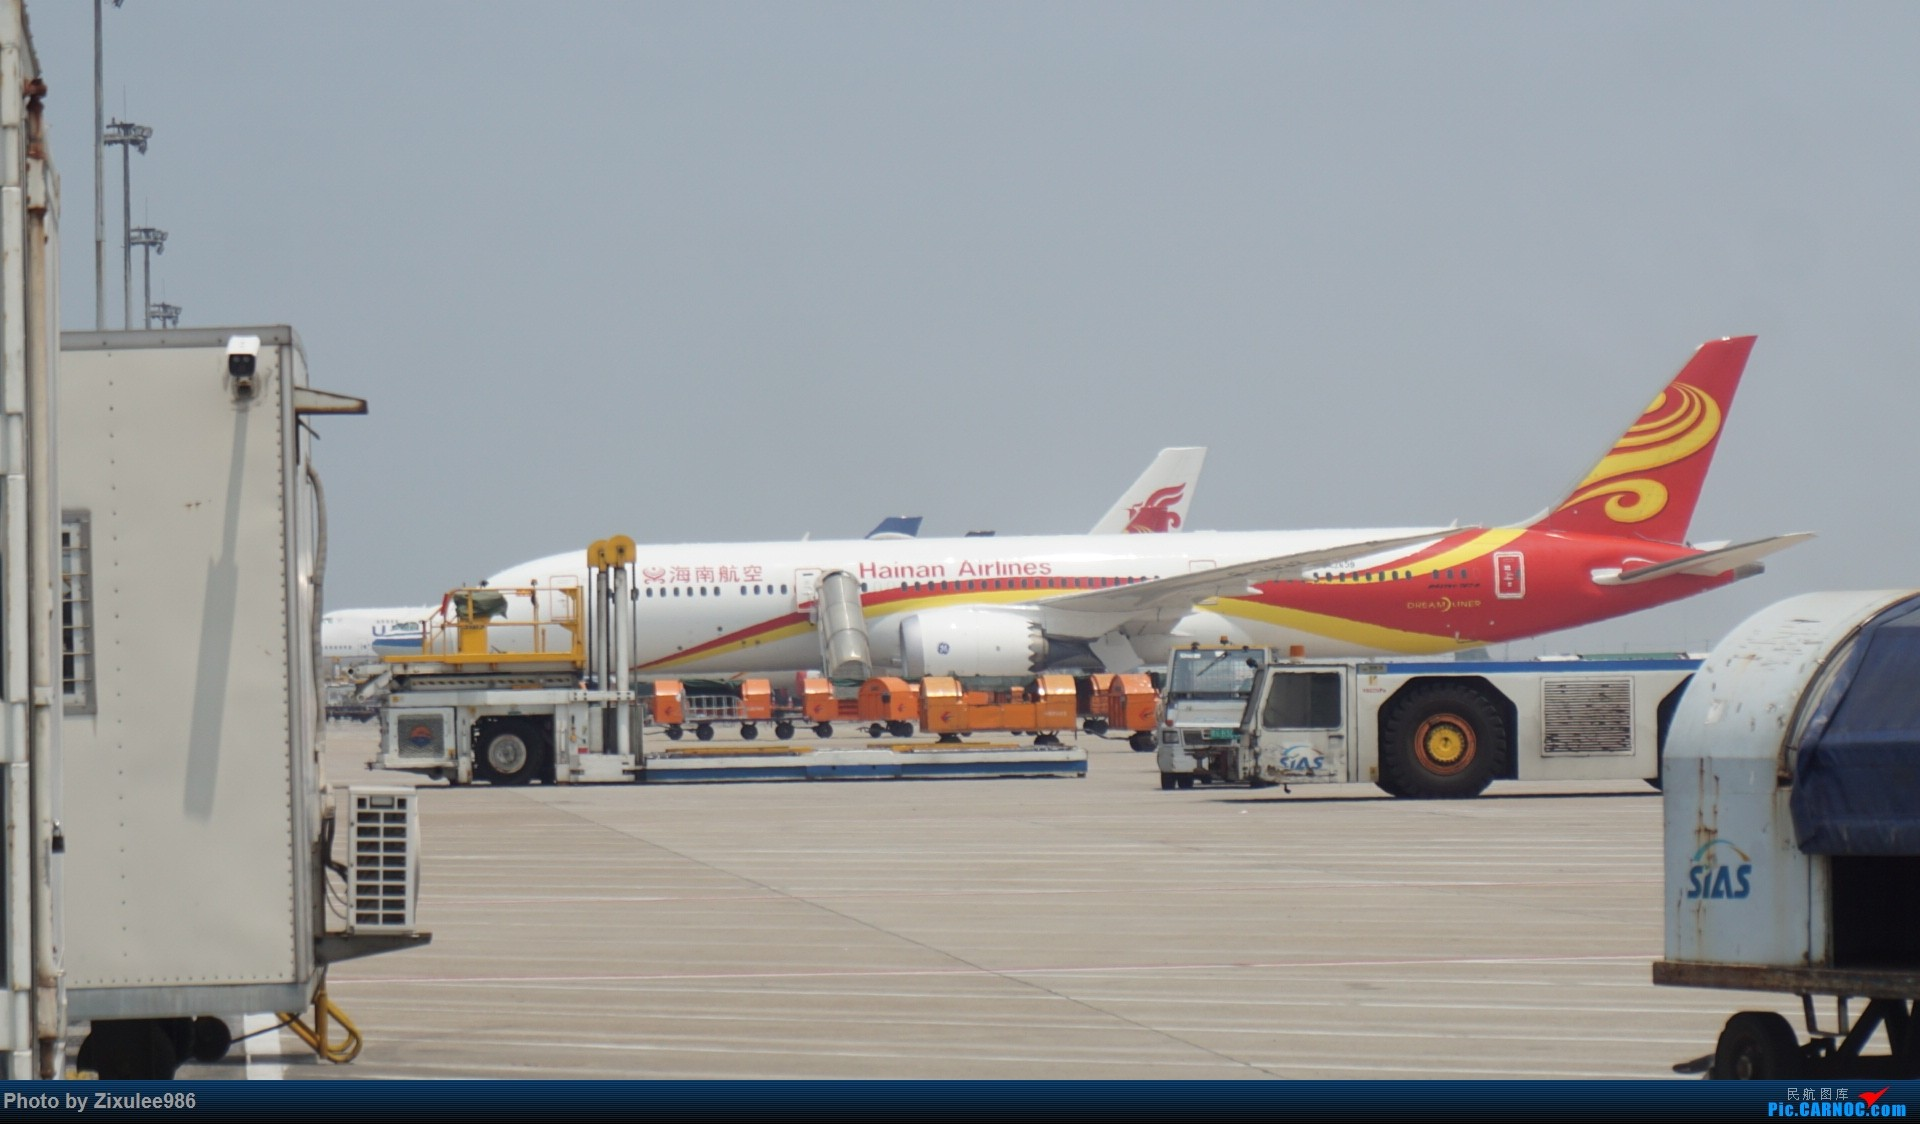 Re:[原创]加拿大21日游学之旅(一)~JJN-PVG-YYZ..(内含flightlog)~第一次发游记~多图缓更请谅解 BOEING 787-9 B-7839 中国上海浦东国际机场